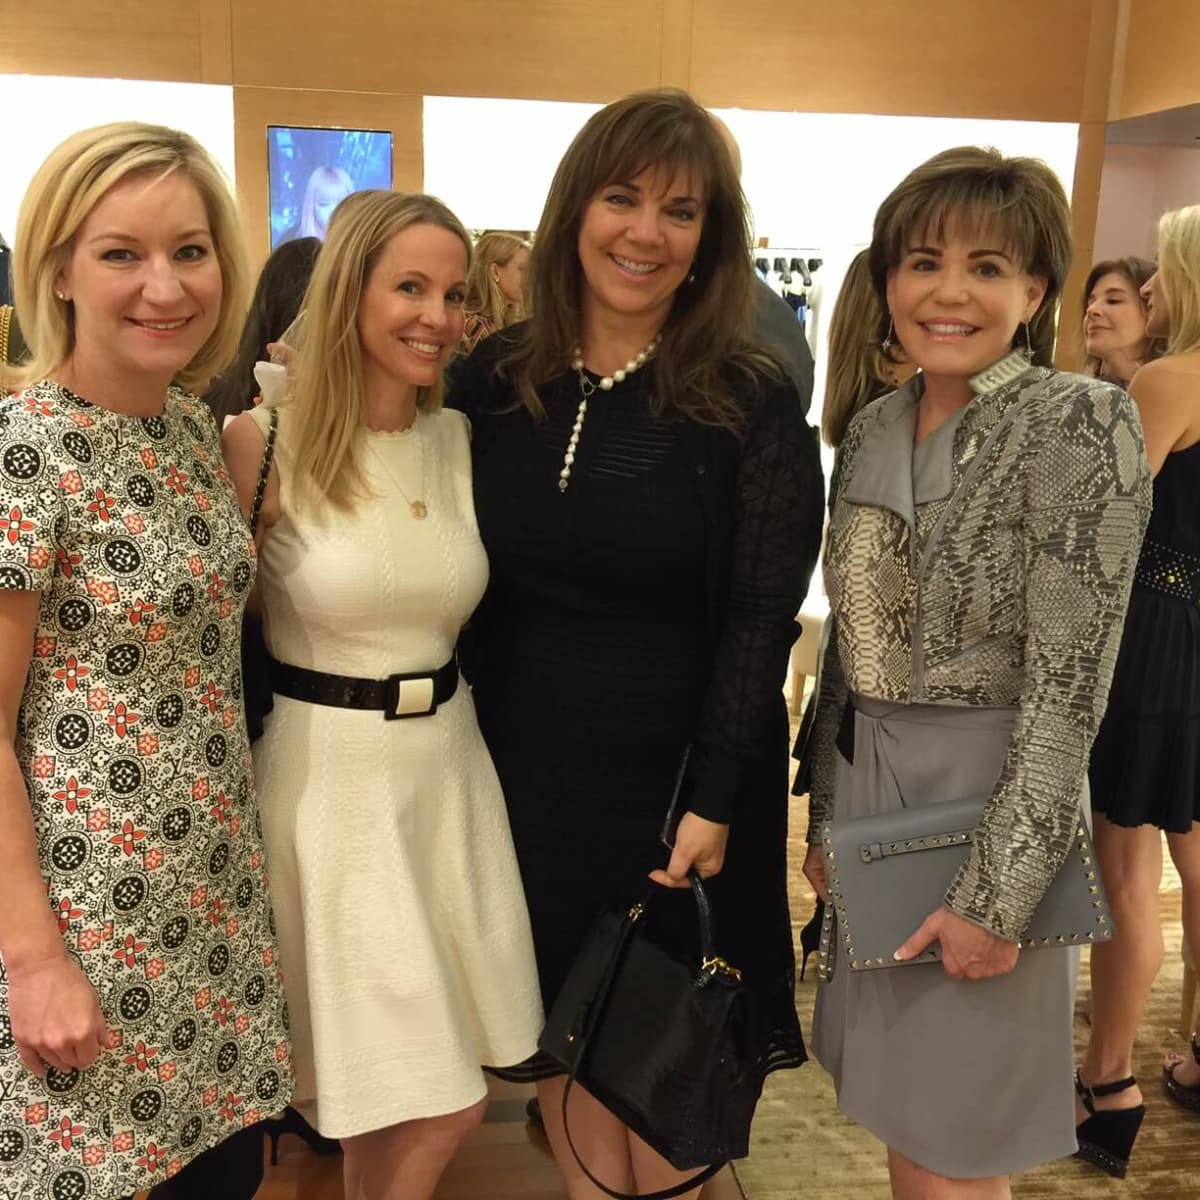 Vogue, Louis Vuitton lunch, 9/26 Emily Paull, Raquel Segal, Terri Havens, Hallie Vandiver